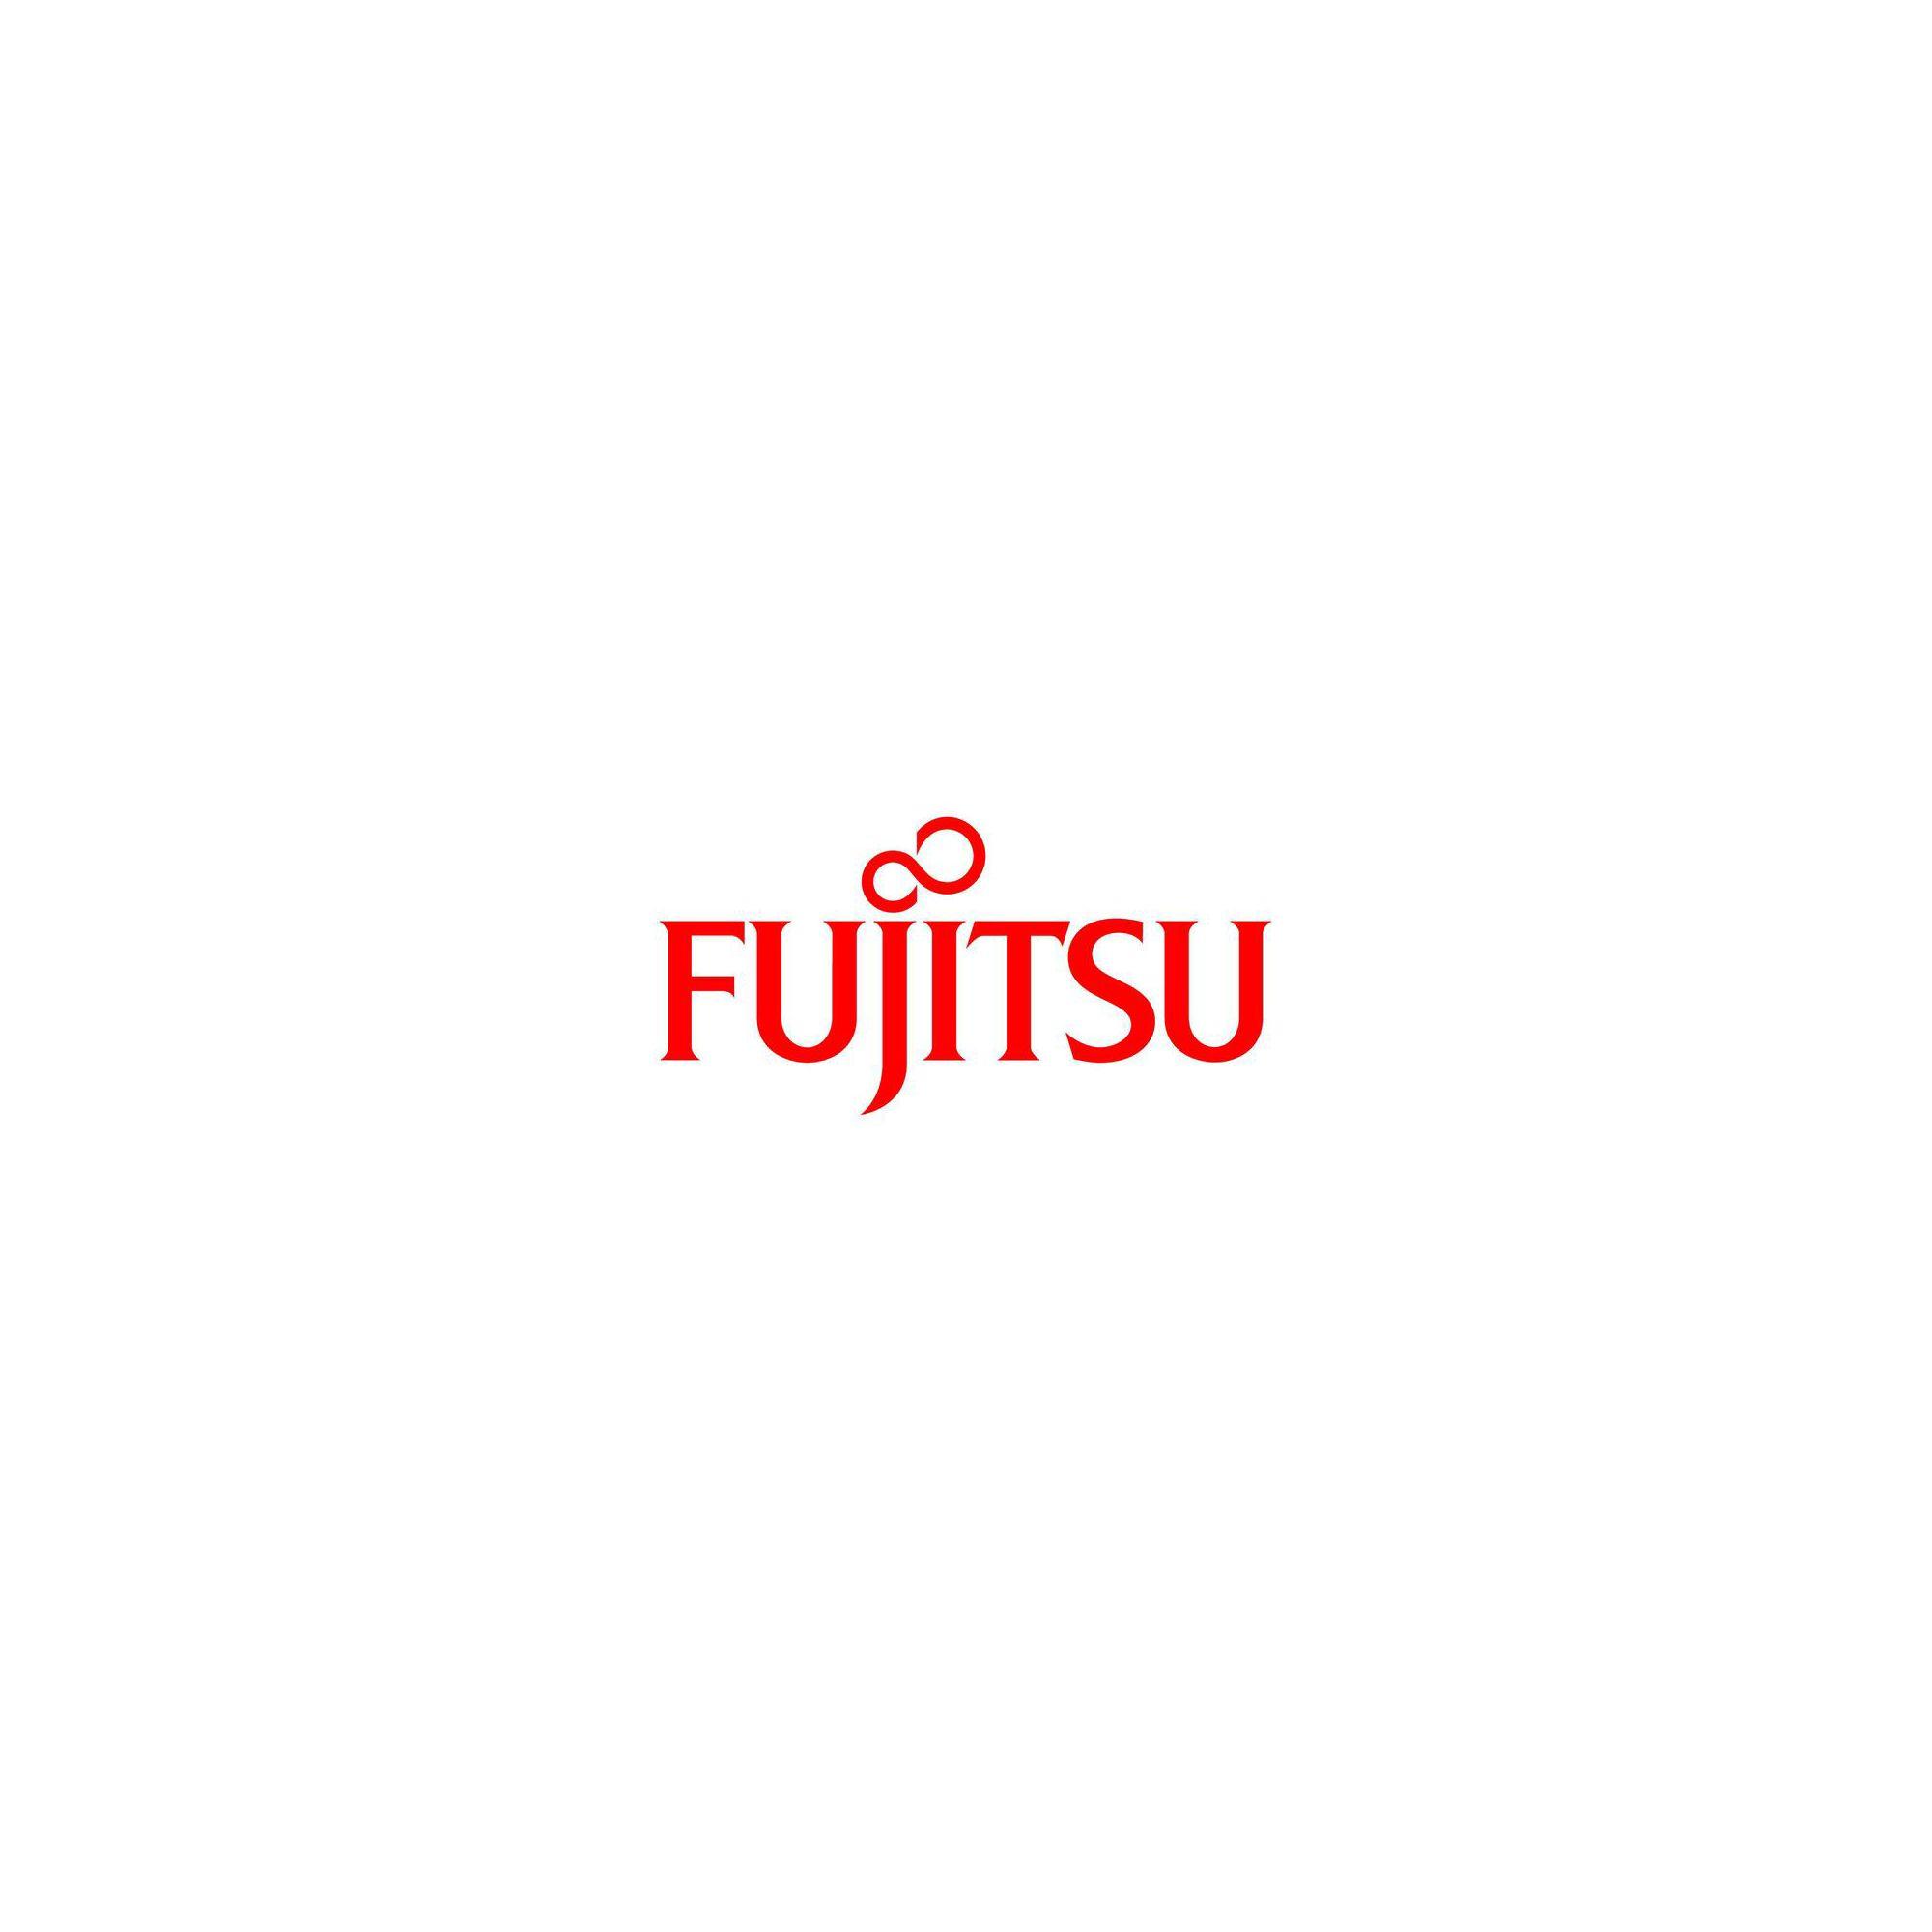 Fujitsu 1000GB 7200RPM 3.5 inch SATA Hard Disk Drive at Tesco Direct